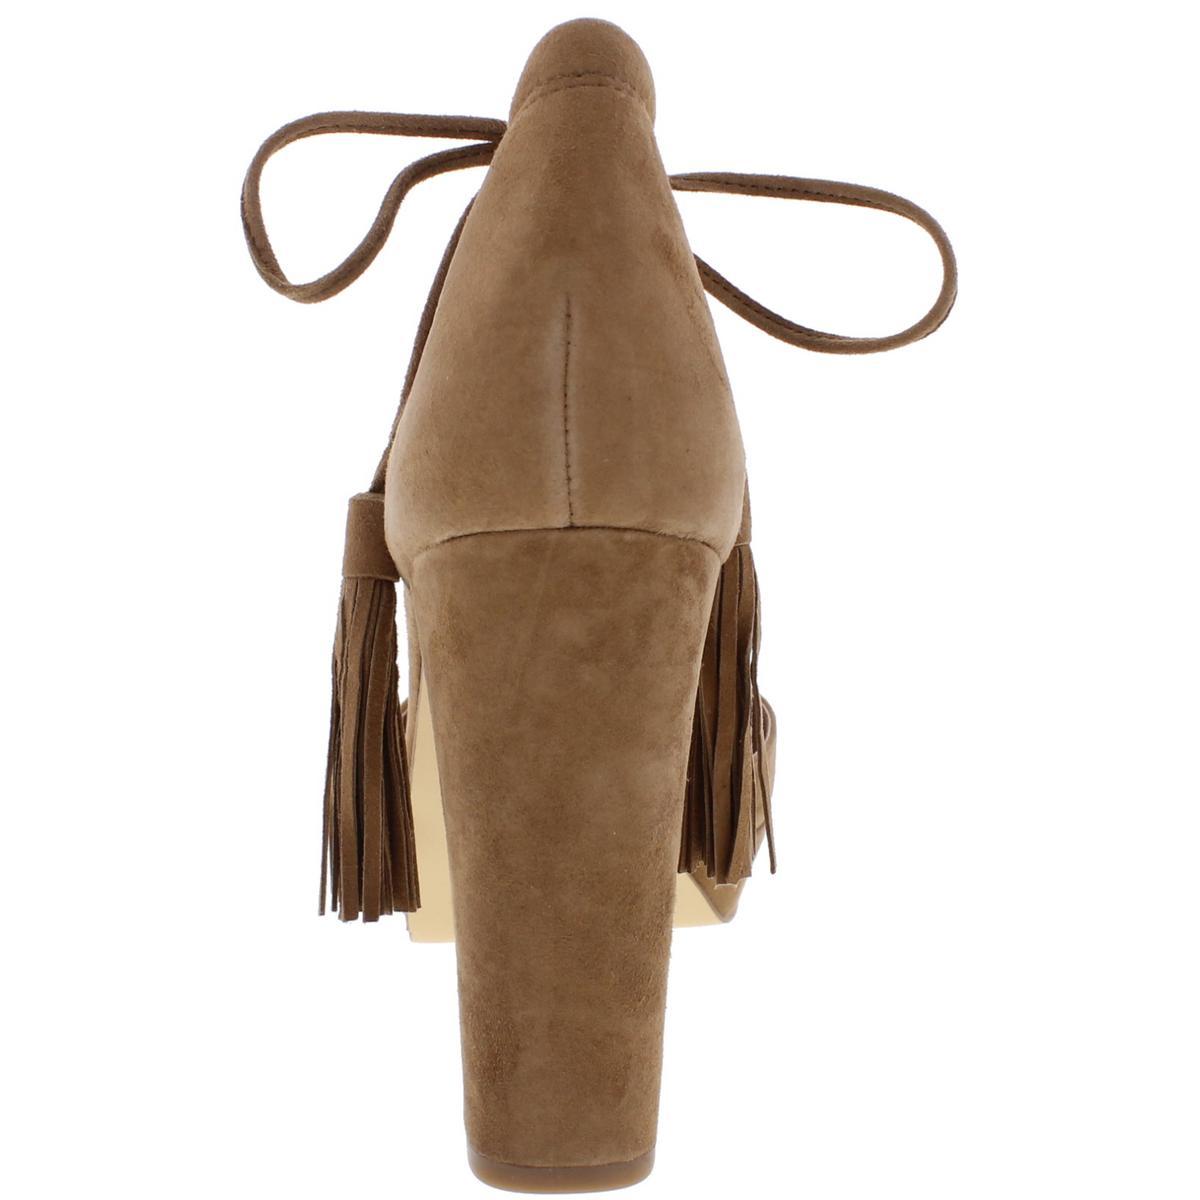 55e45a6c8500 424 Fifth Womens Mara Brown Suede HEELS Dress Sandals 9 Medium (b M ...